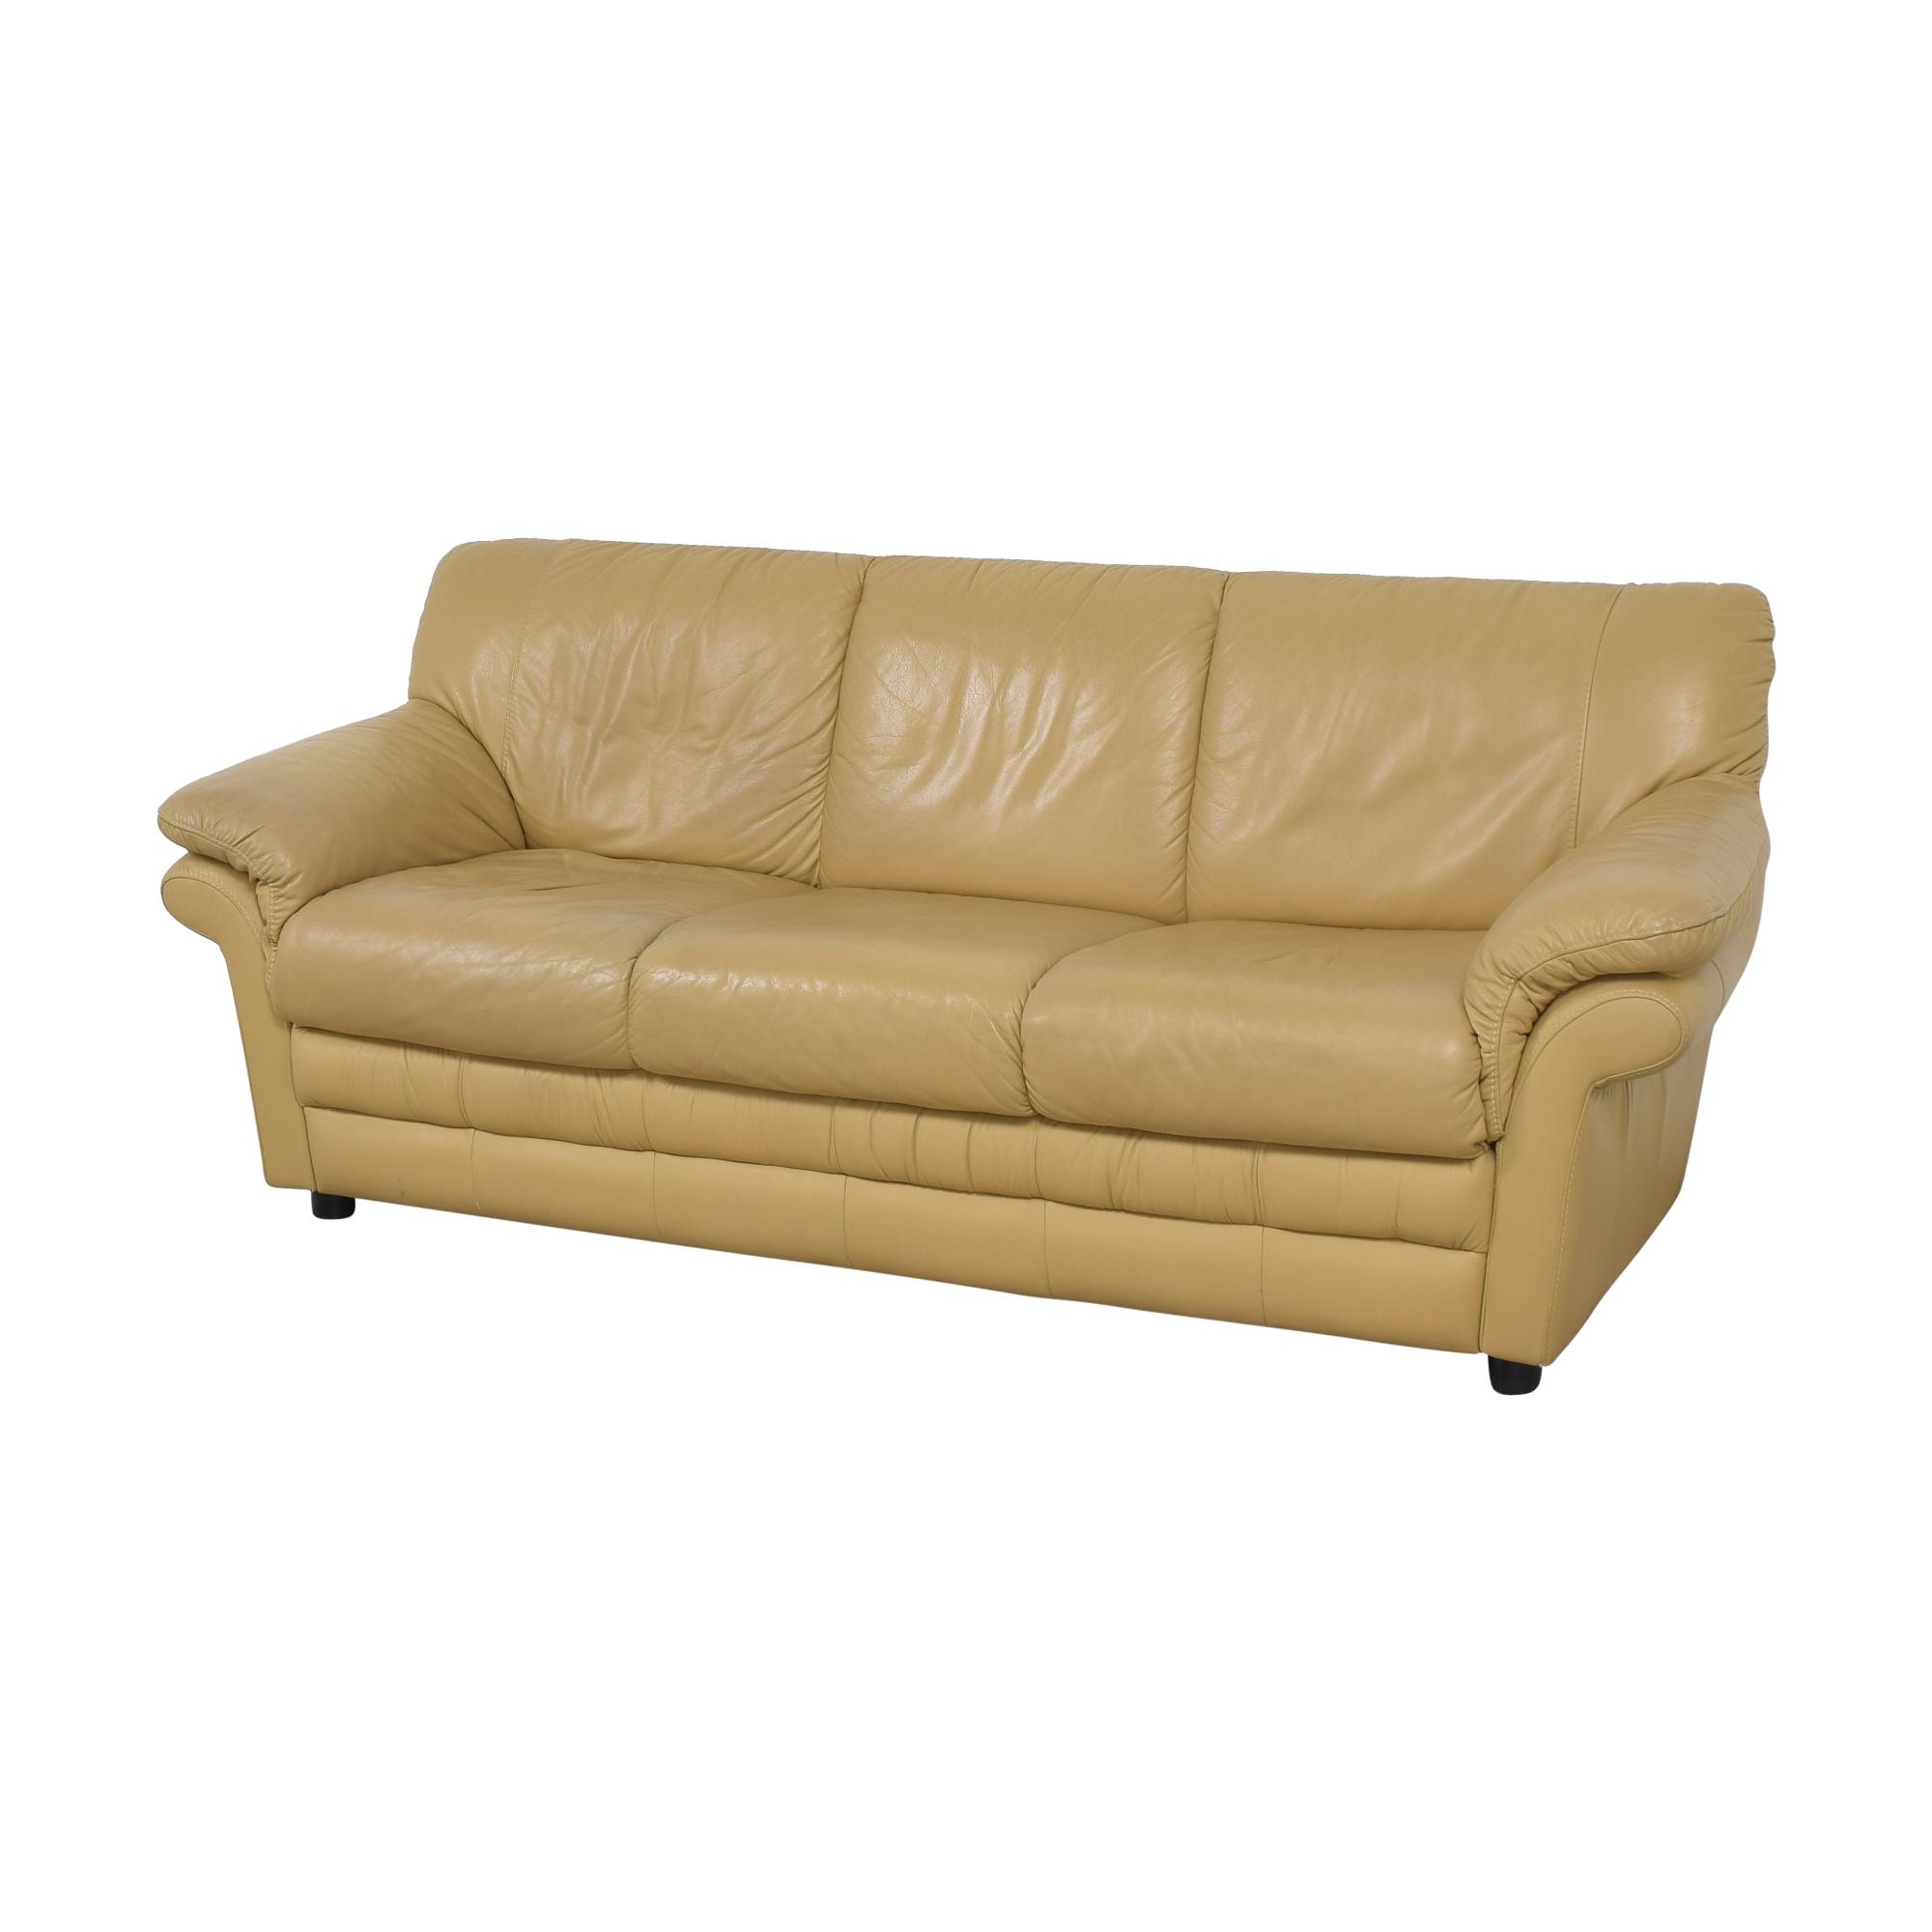 Three Cushion Sofa second hand